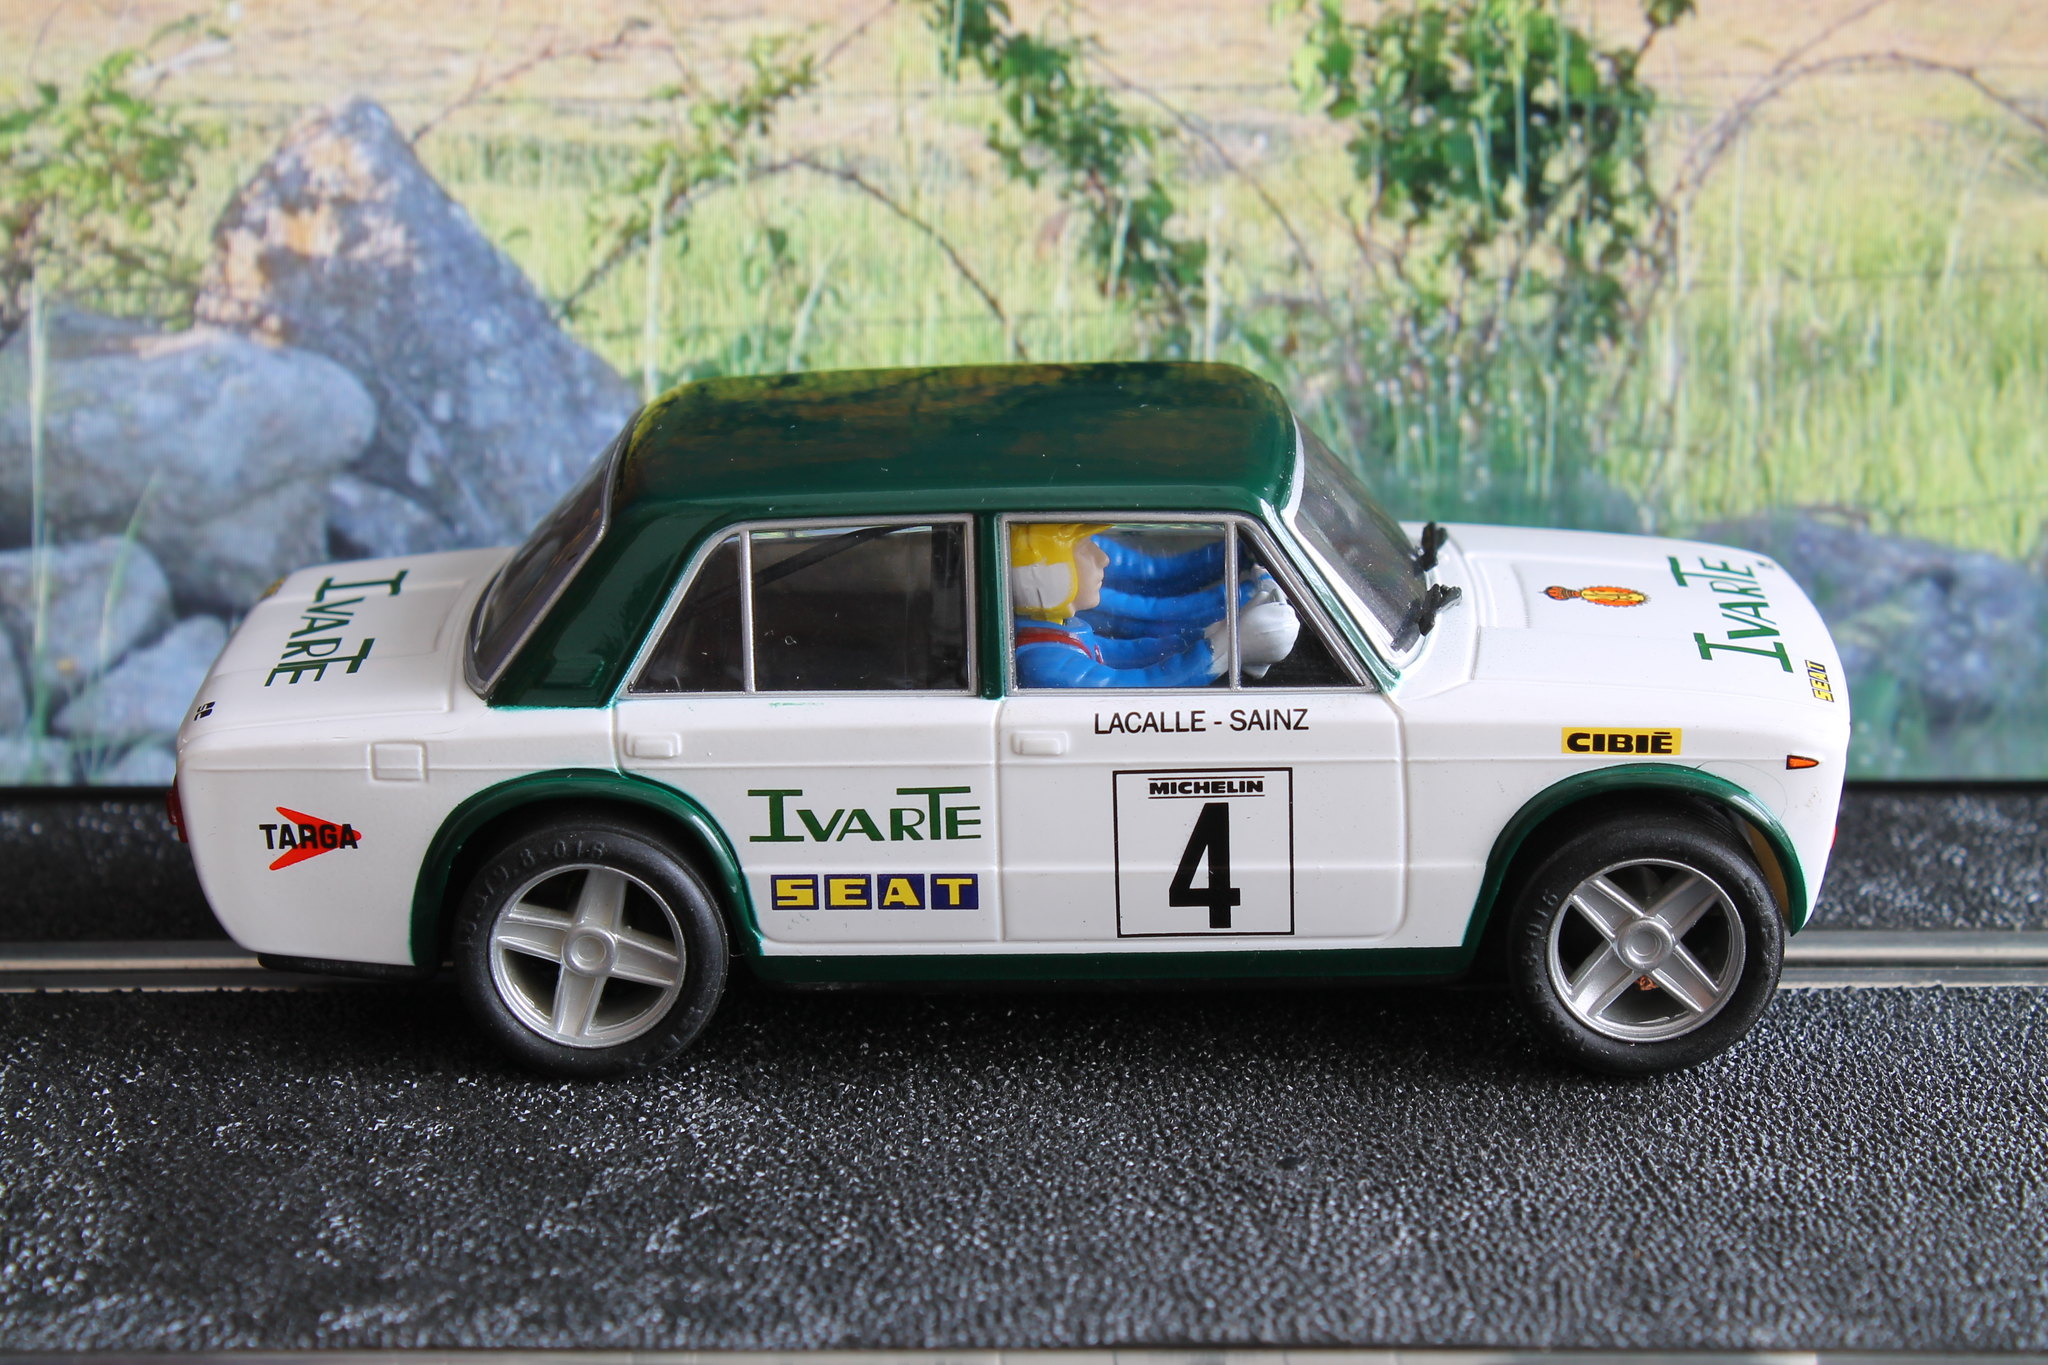 Seat 1430 1800 carlos sainz rally santa teresa 1982 for Seat 1430 fu 1800